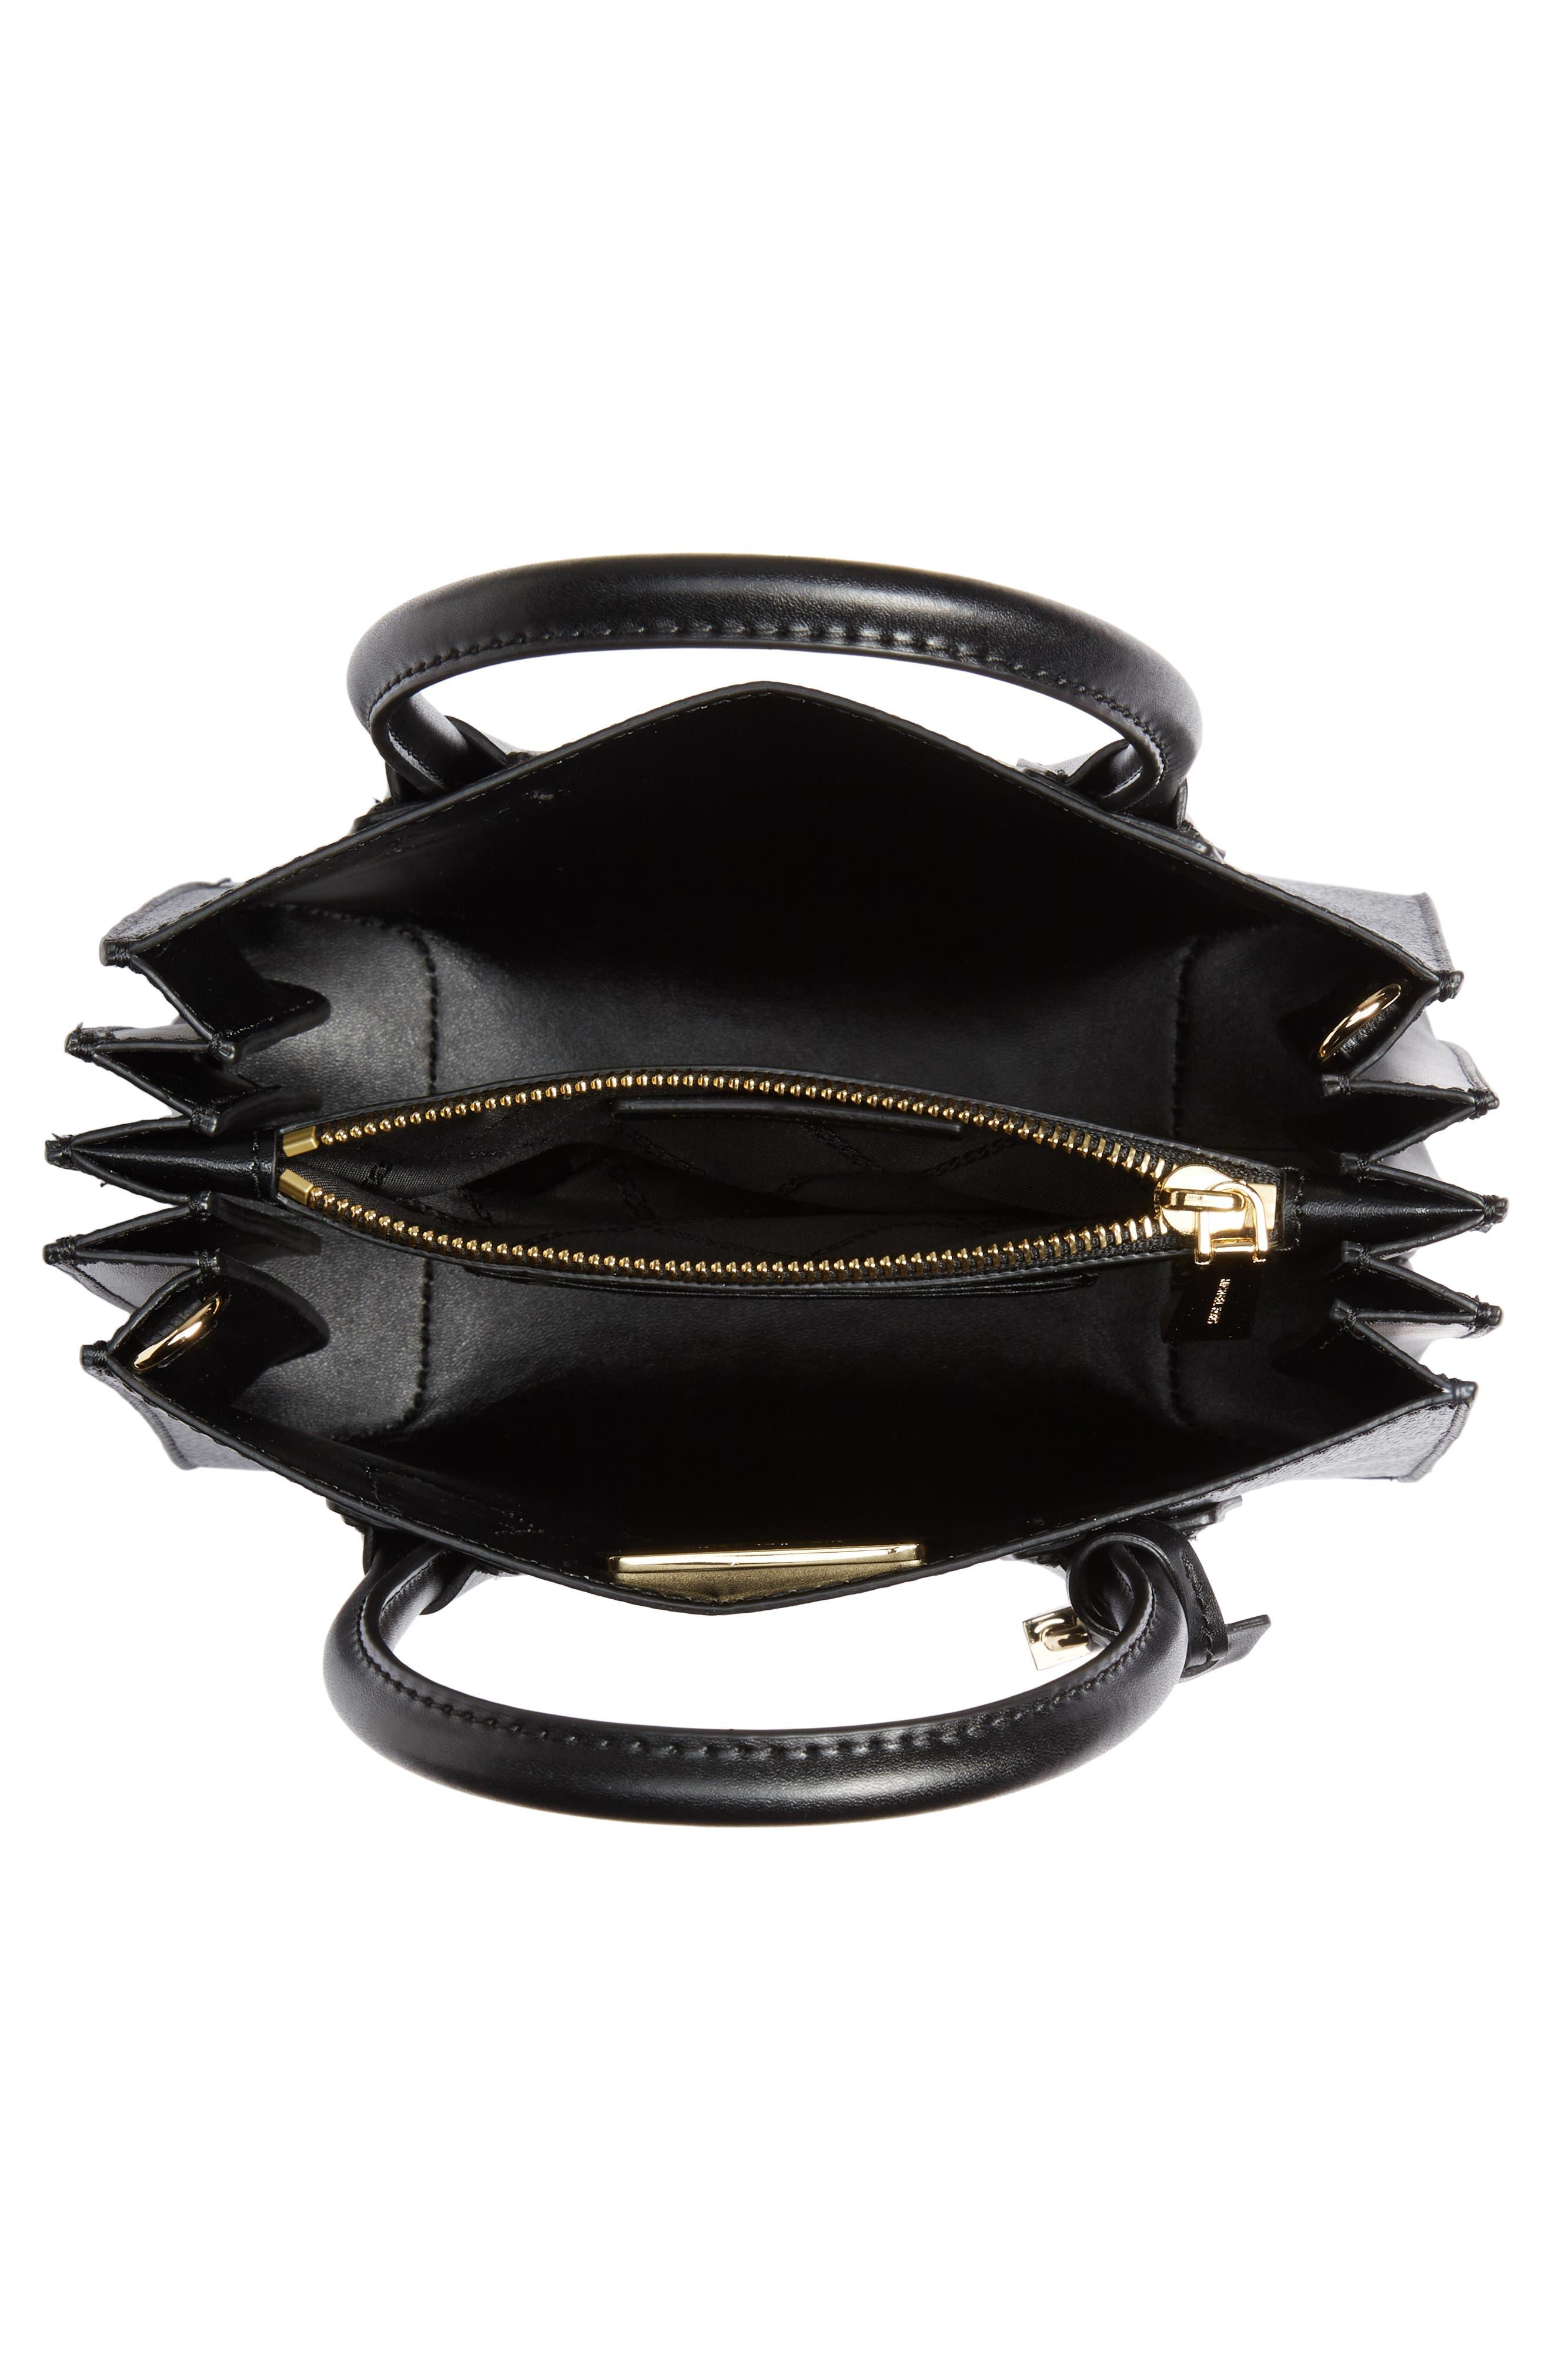 MICHAEL MICHAEL KORS, Medium Mercer Convertible Leather Tote, Alternate thumbnail 5, color, BLACK